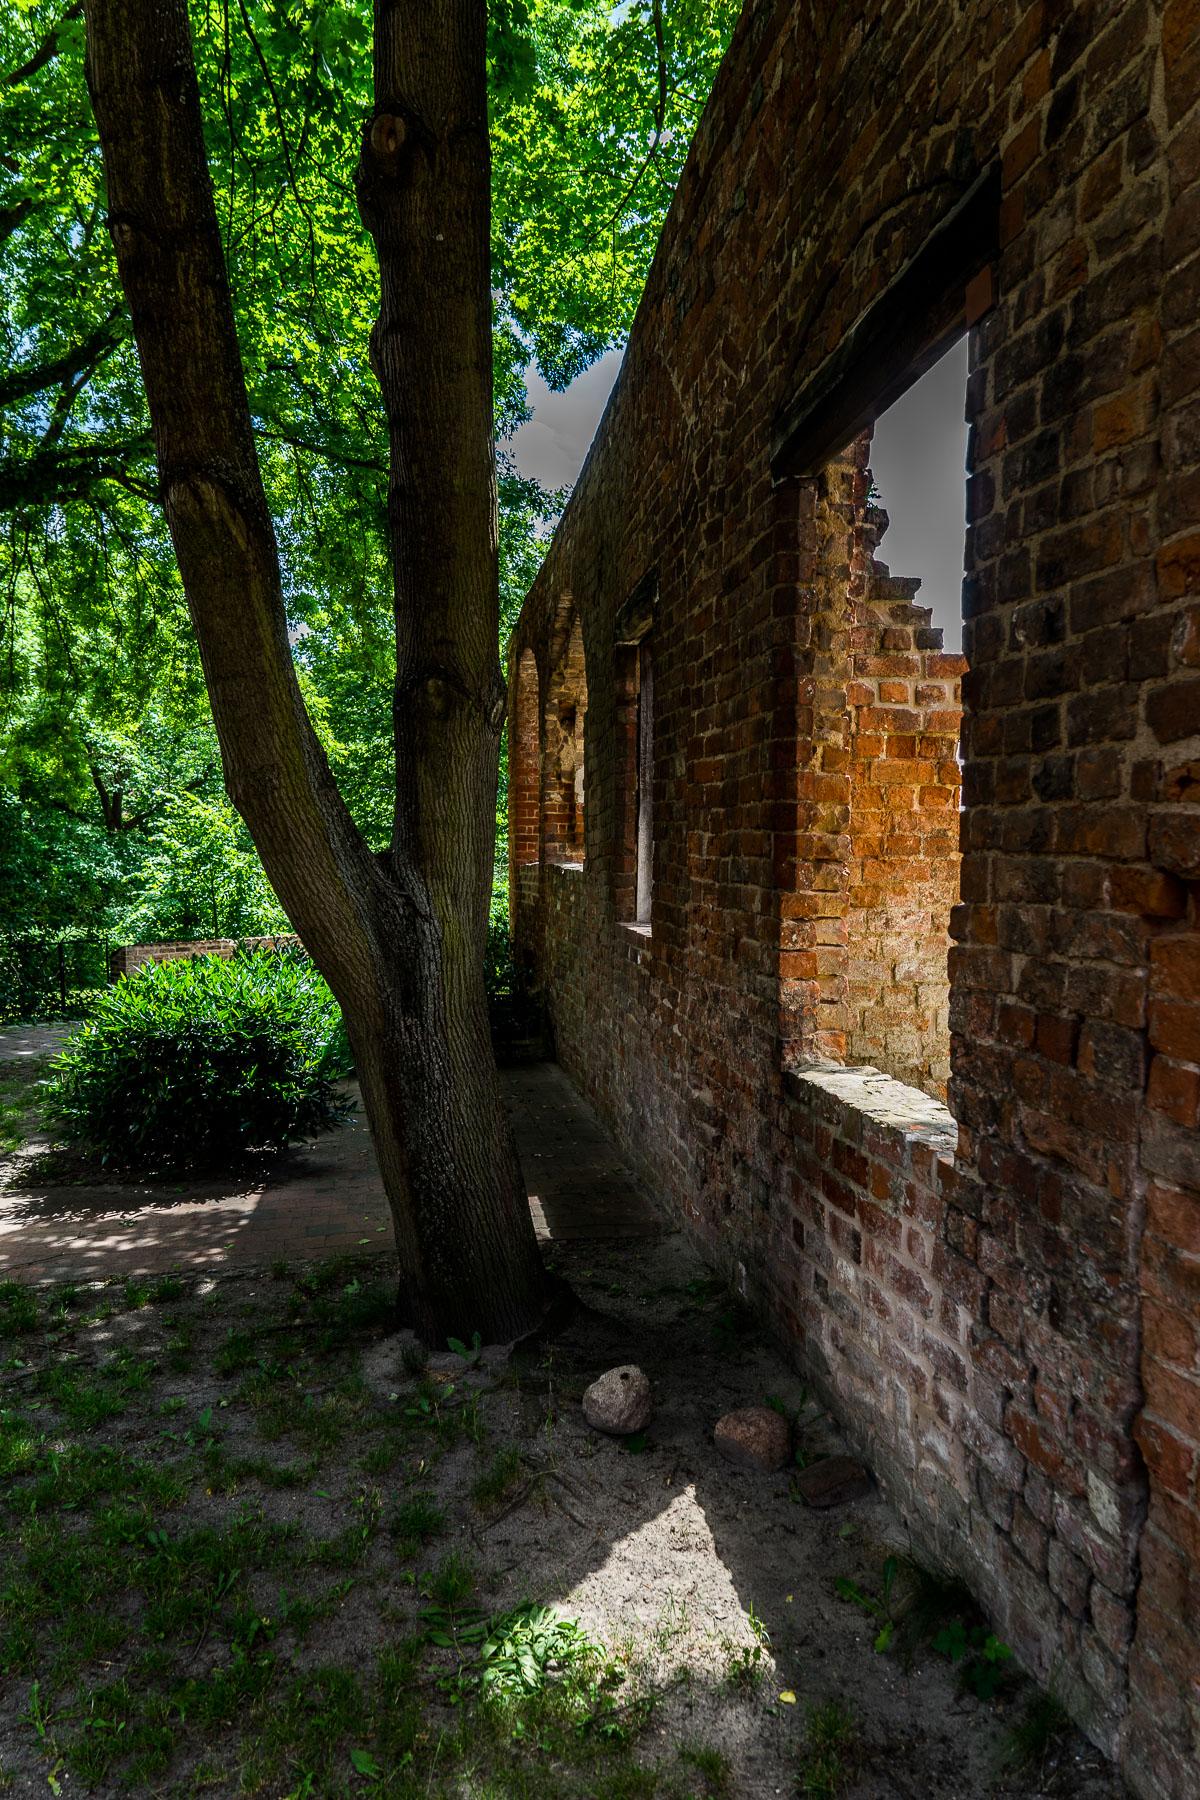 Rainer_Steussloff_Sacred_places_Kloster_Lehnin.jpg